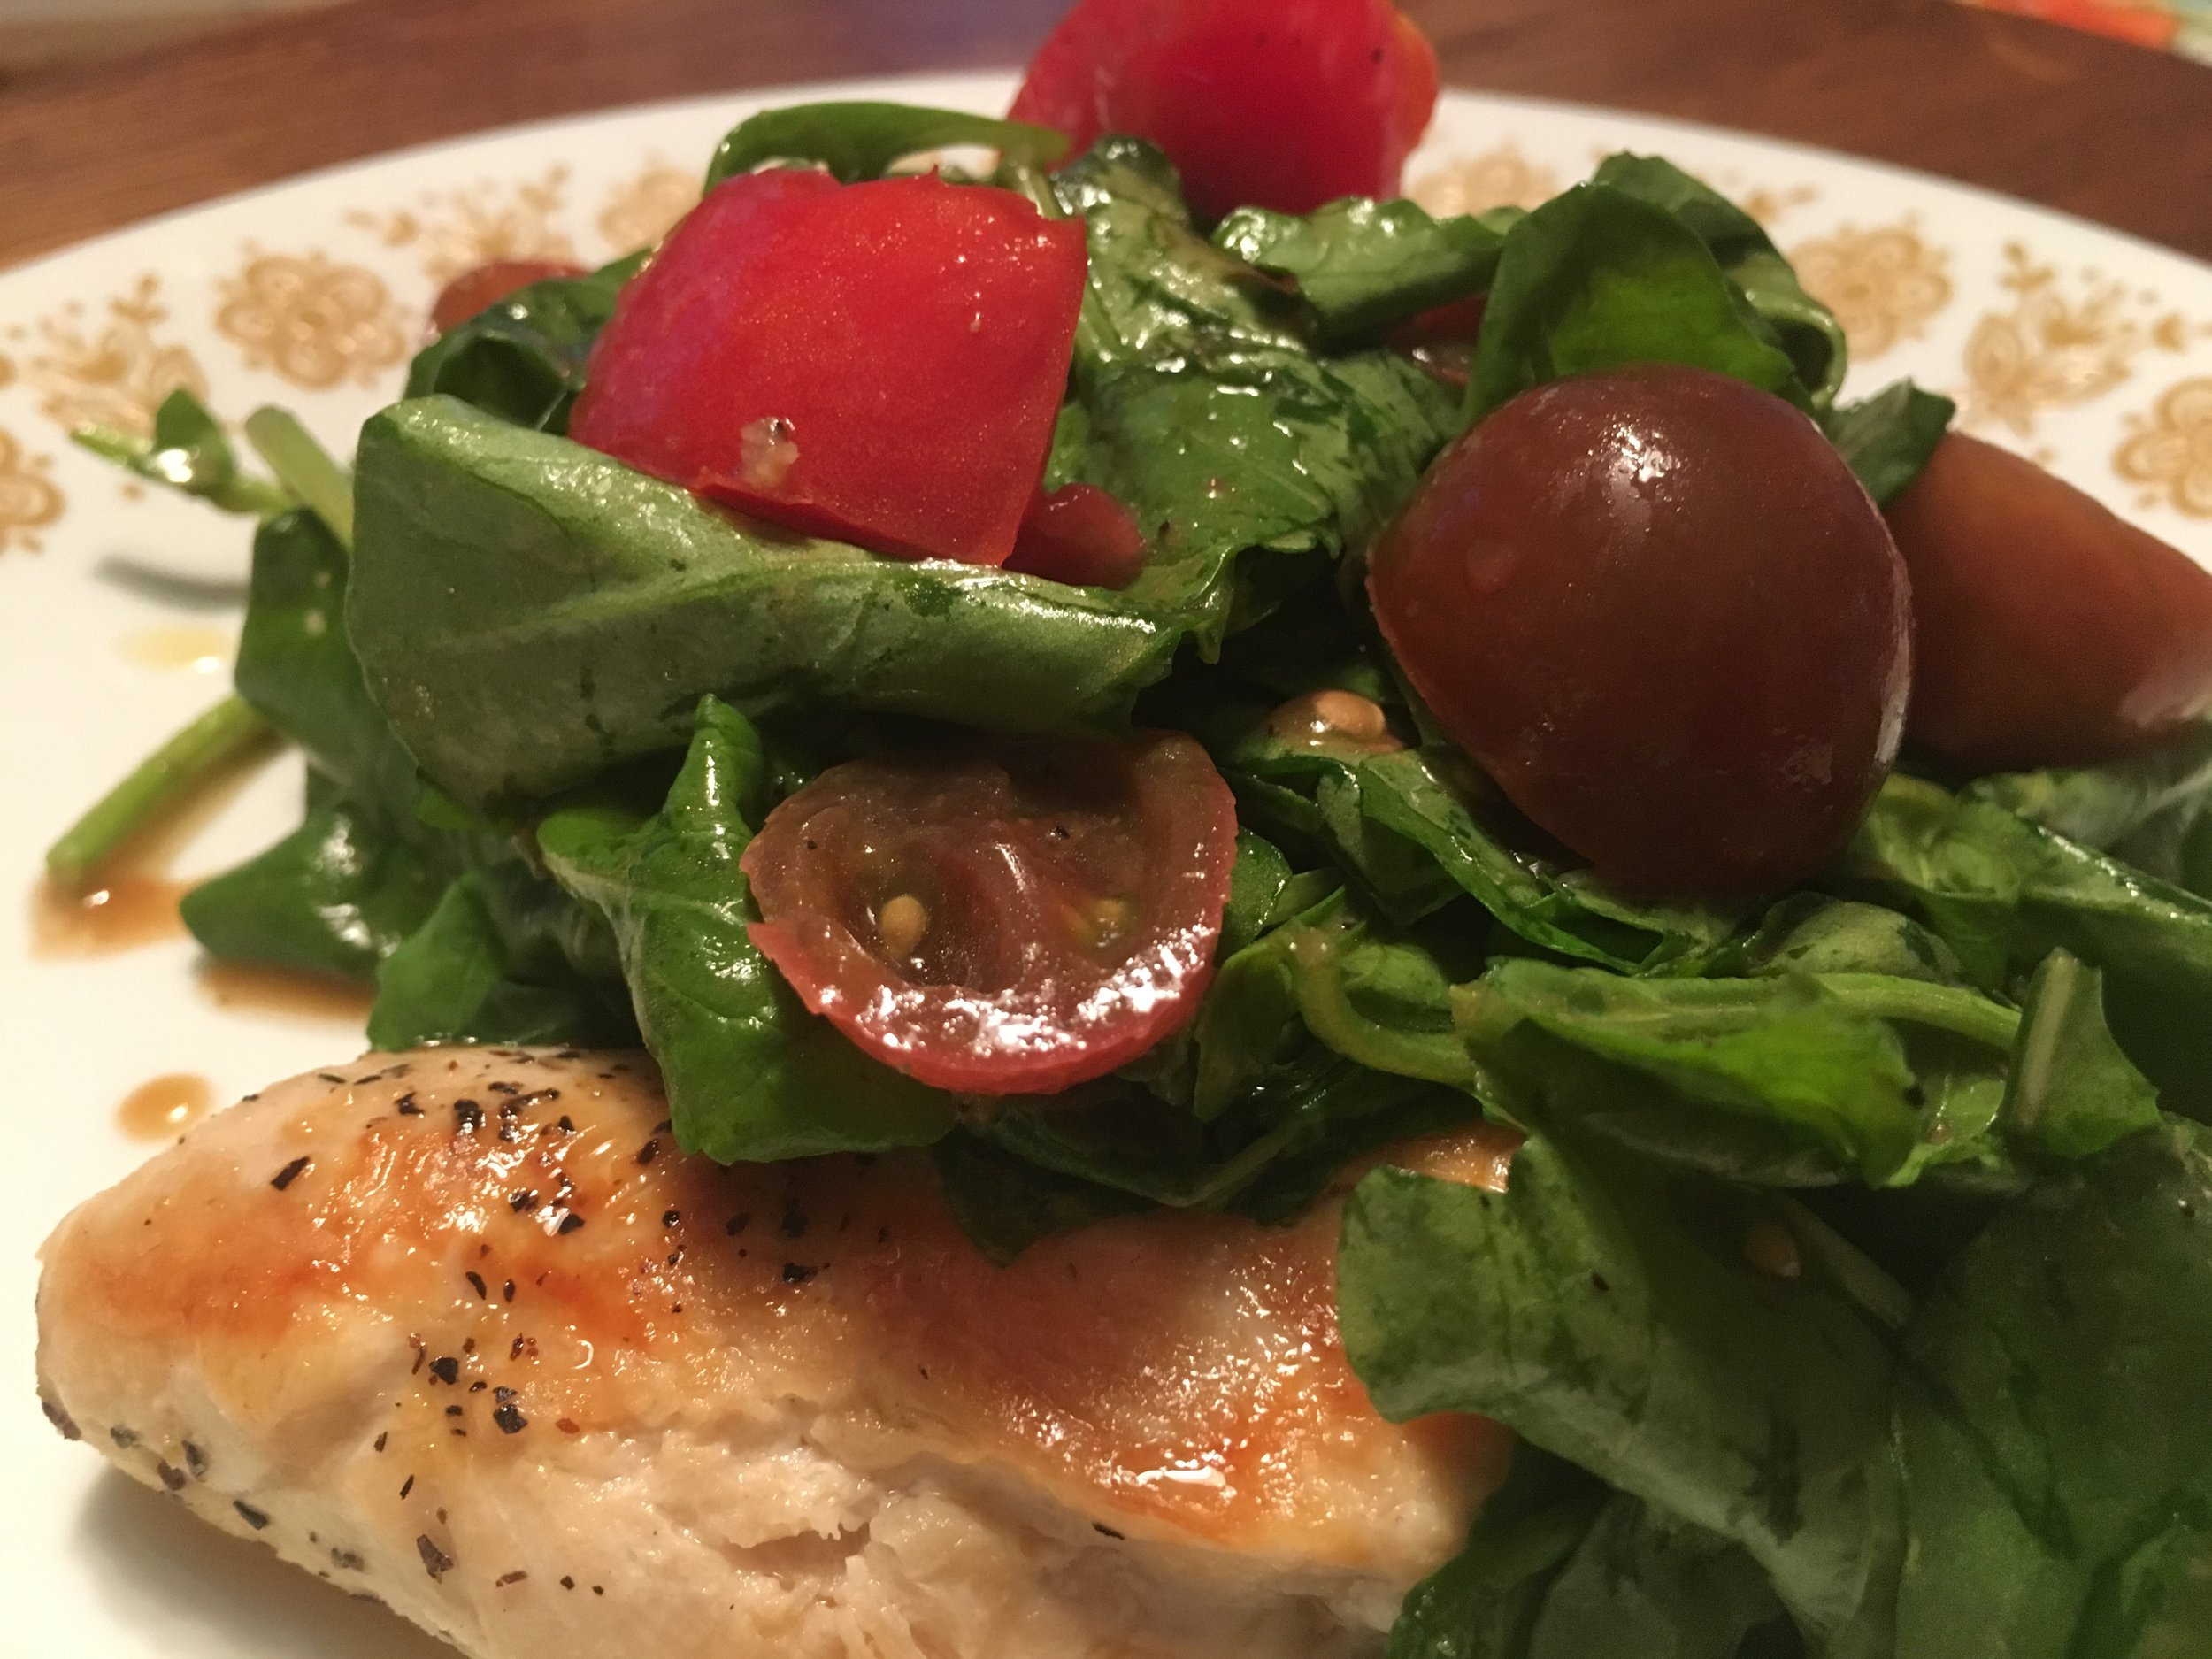 Chicken Paillard With Tomato And Arugula Salad 5 Seasons Diet